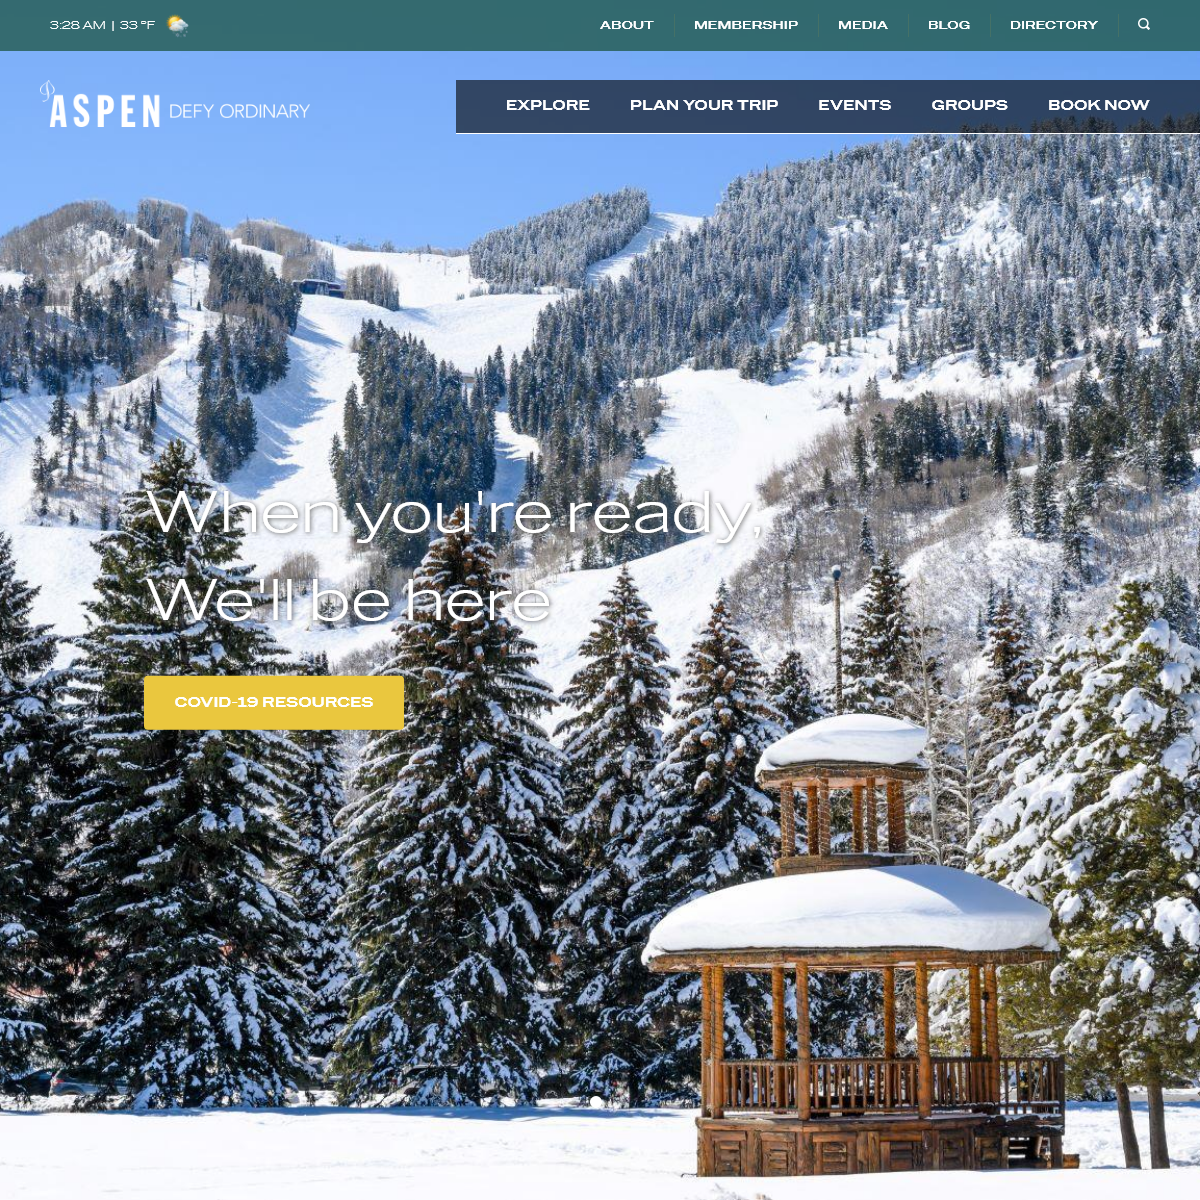 A Welcoming Mountain Town; Defy Ordinary - Aspen, CO